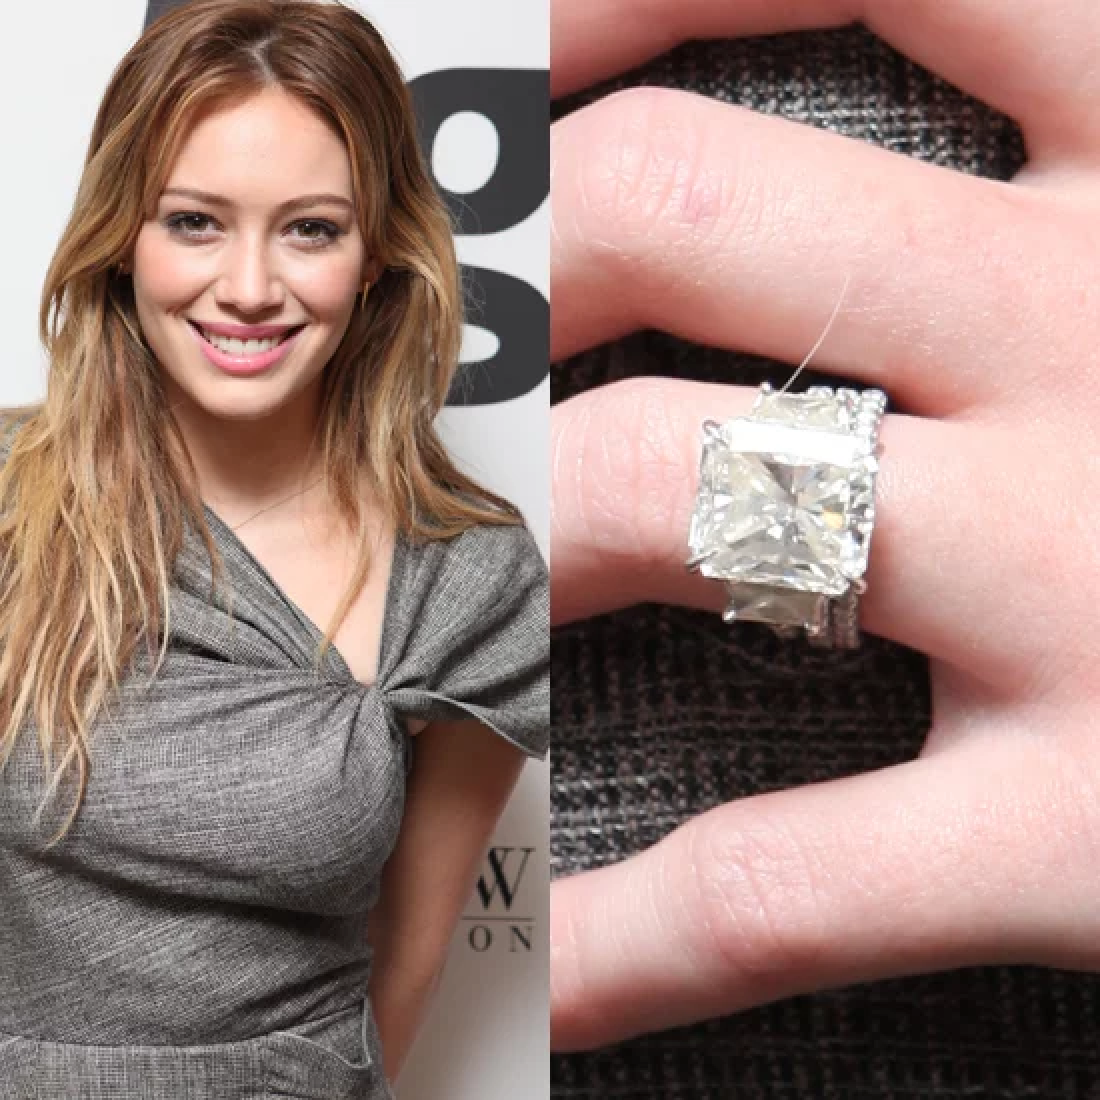 Celebrity Jewelry: Hilary Duff Prefers a Beautiful Emerald Cut Diamond Ring